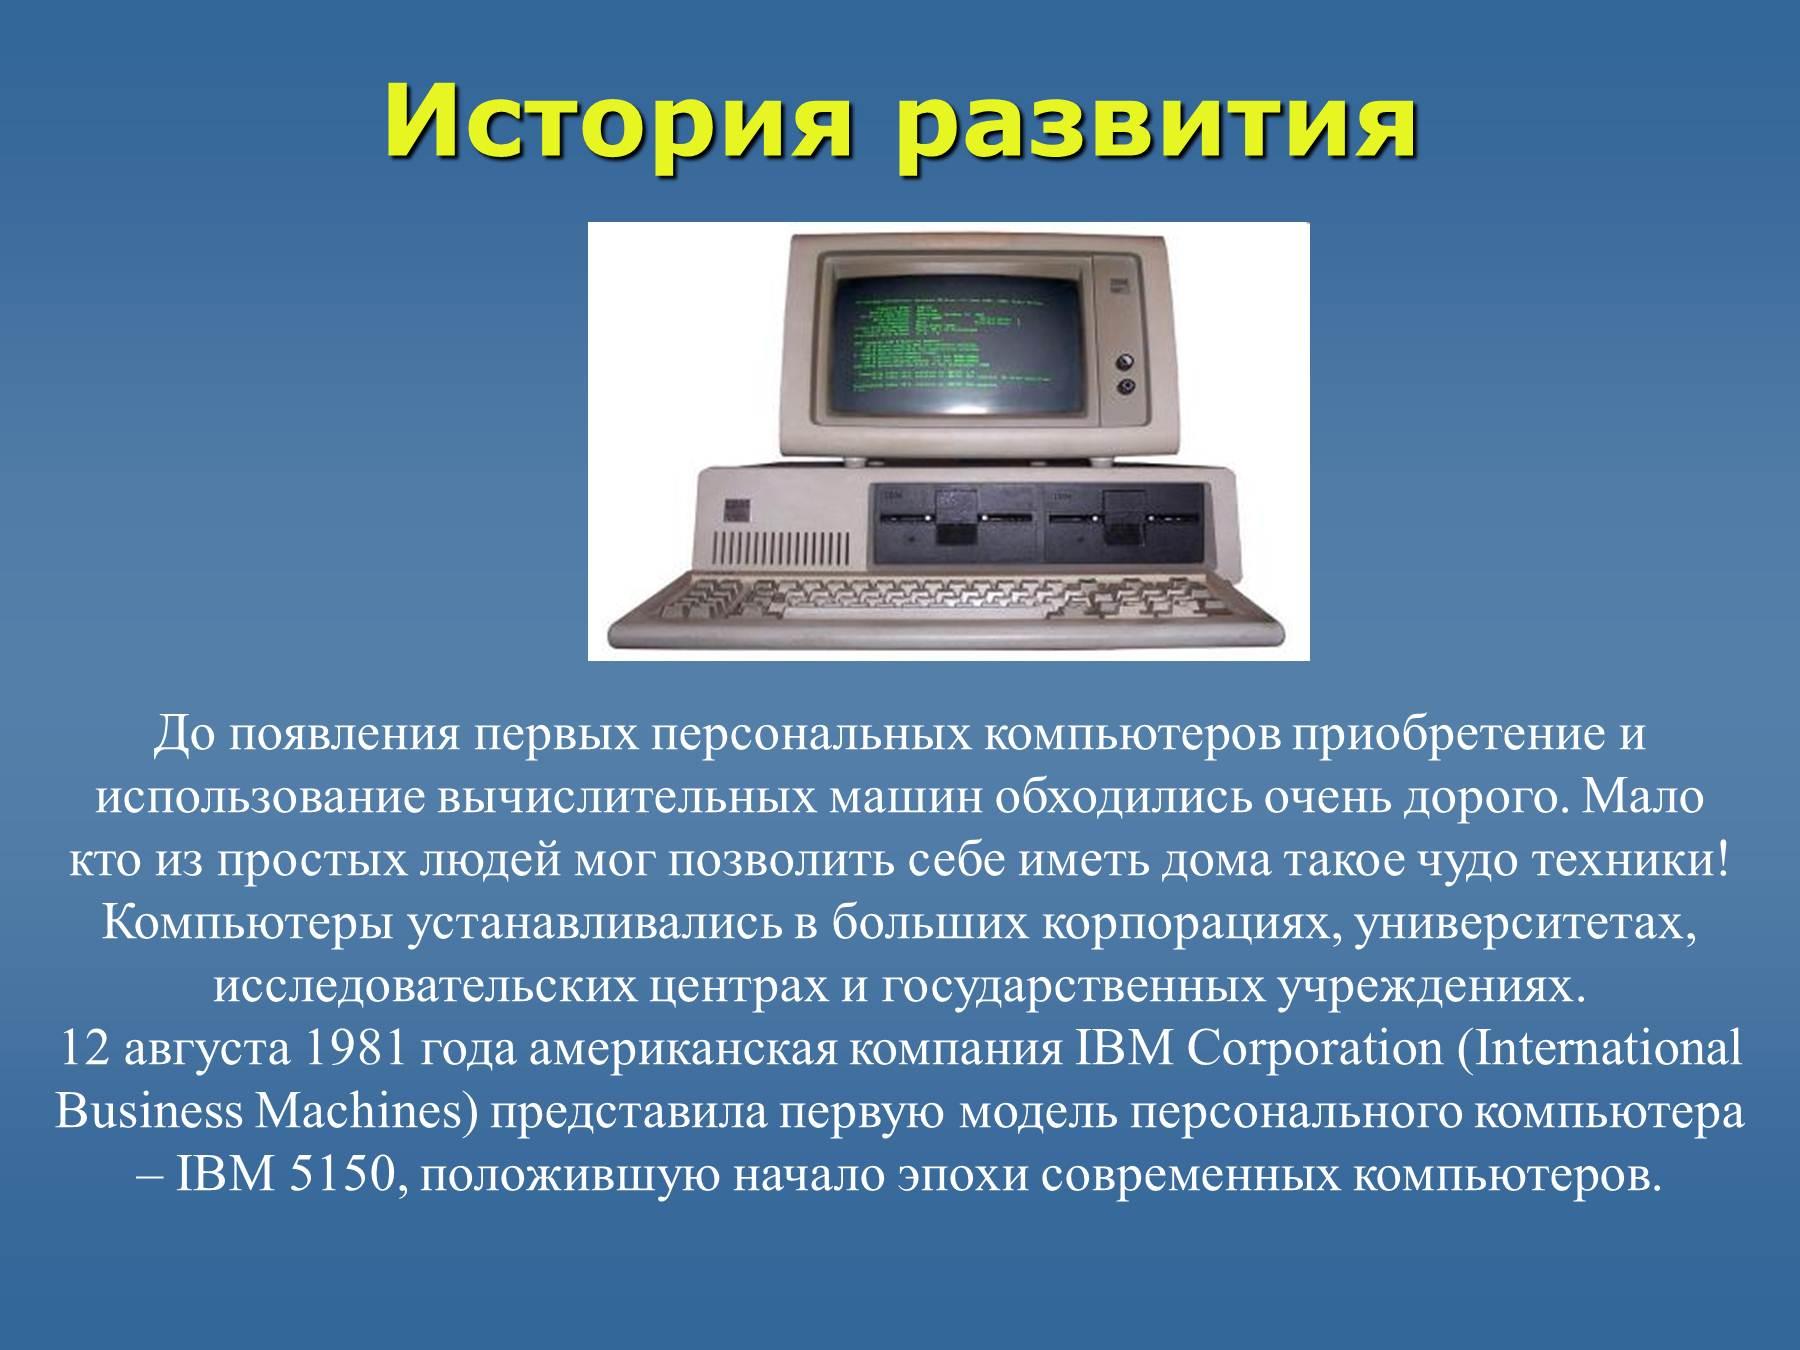 Презентация дизайн история развития